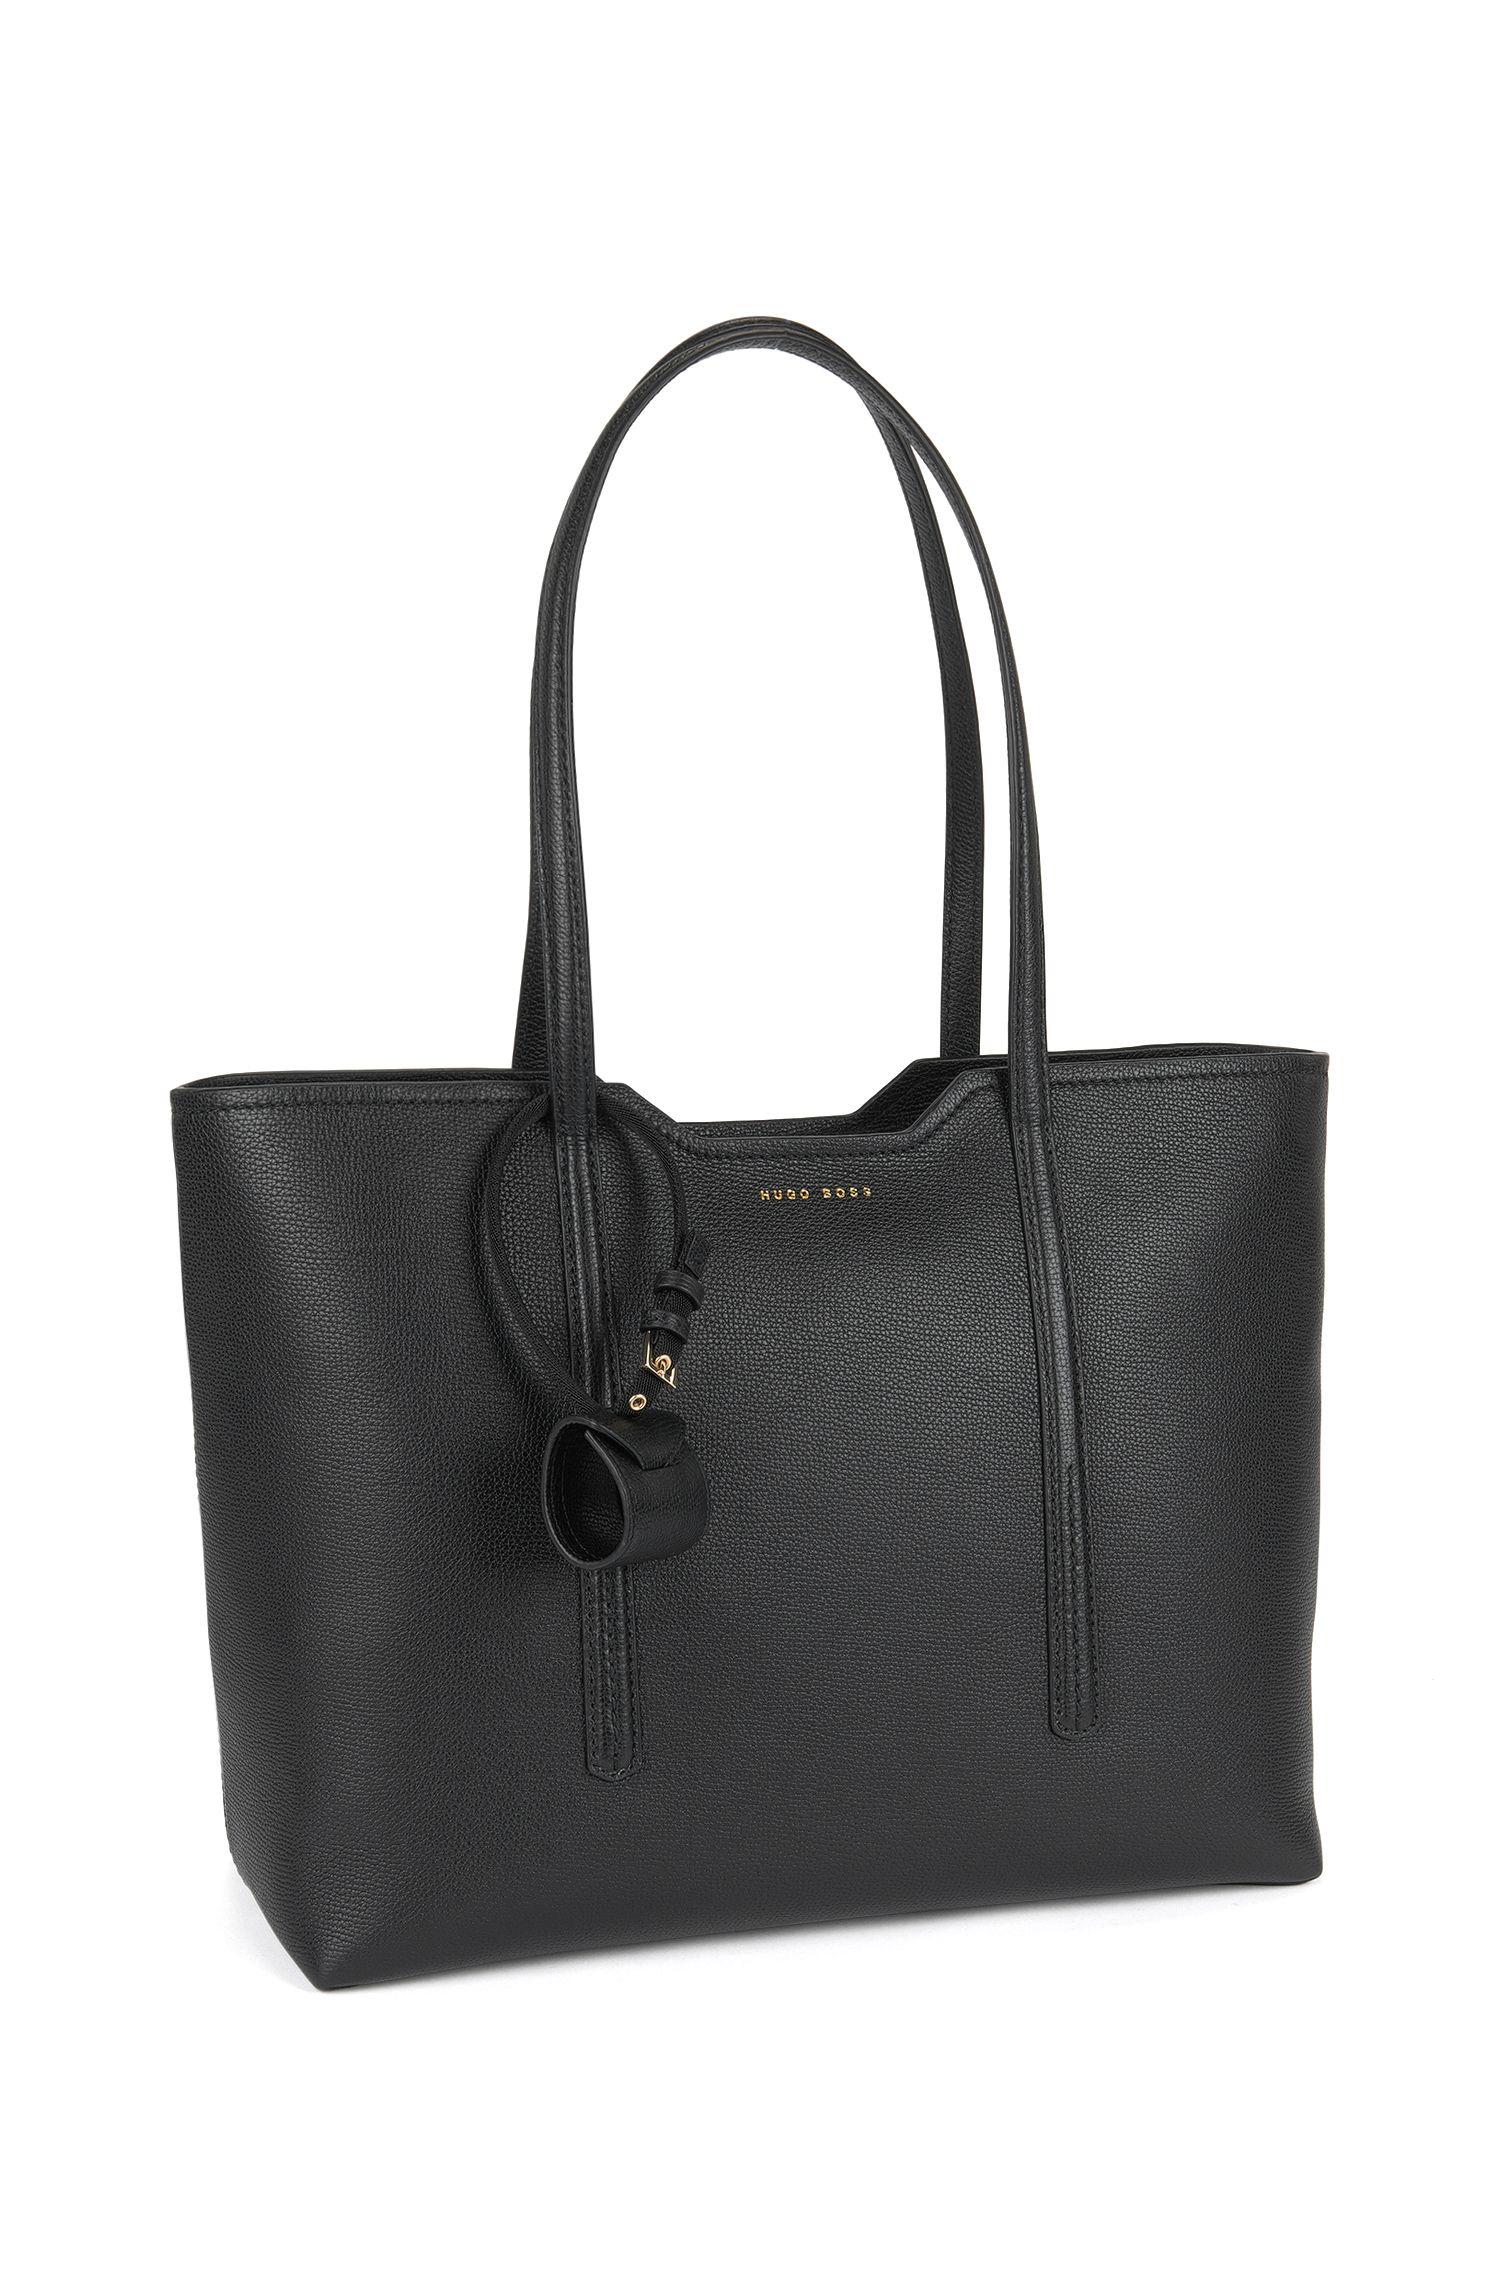 Full-Grain Leather Shopper Tote | Taylor Shopper